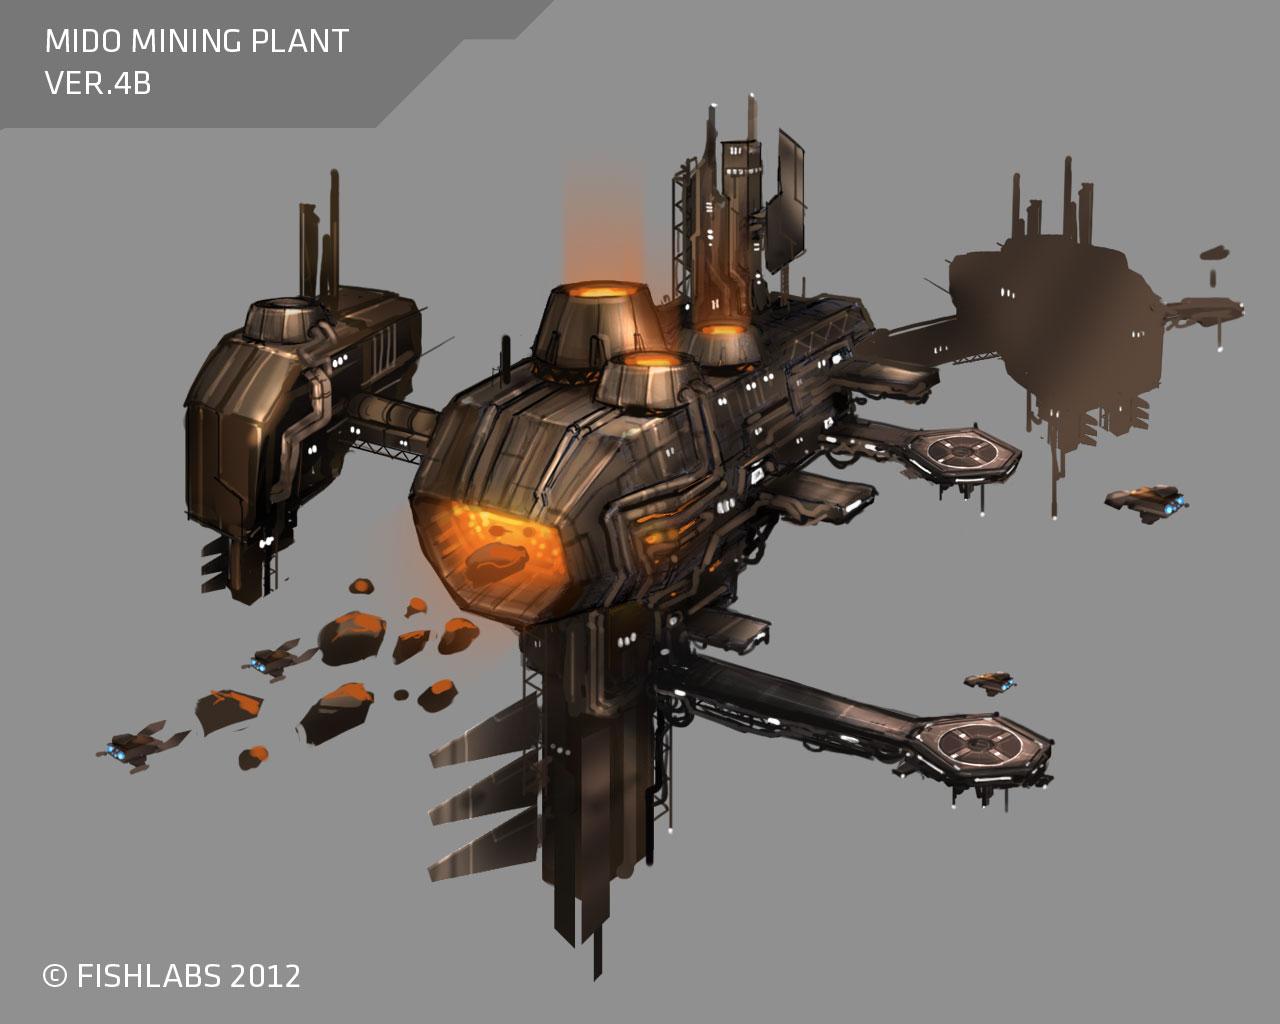 Fishlabs GoF2 Supernova - Mining Ship Mido